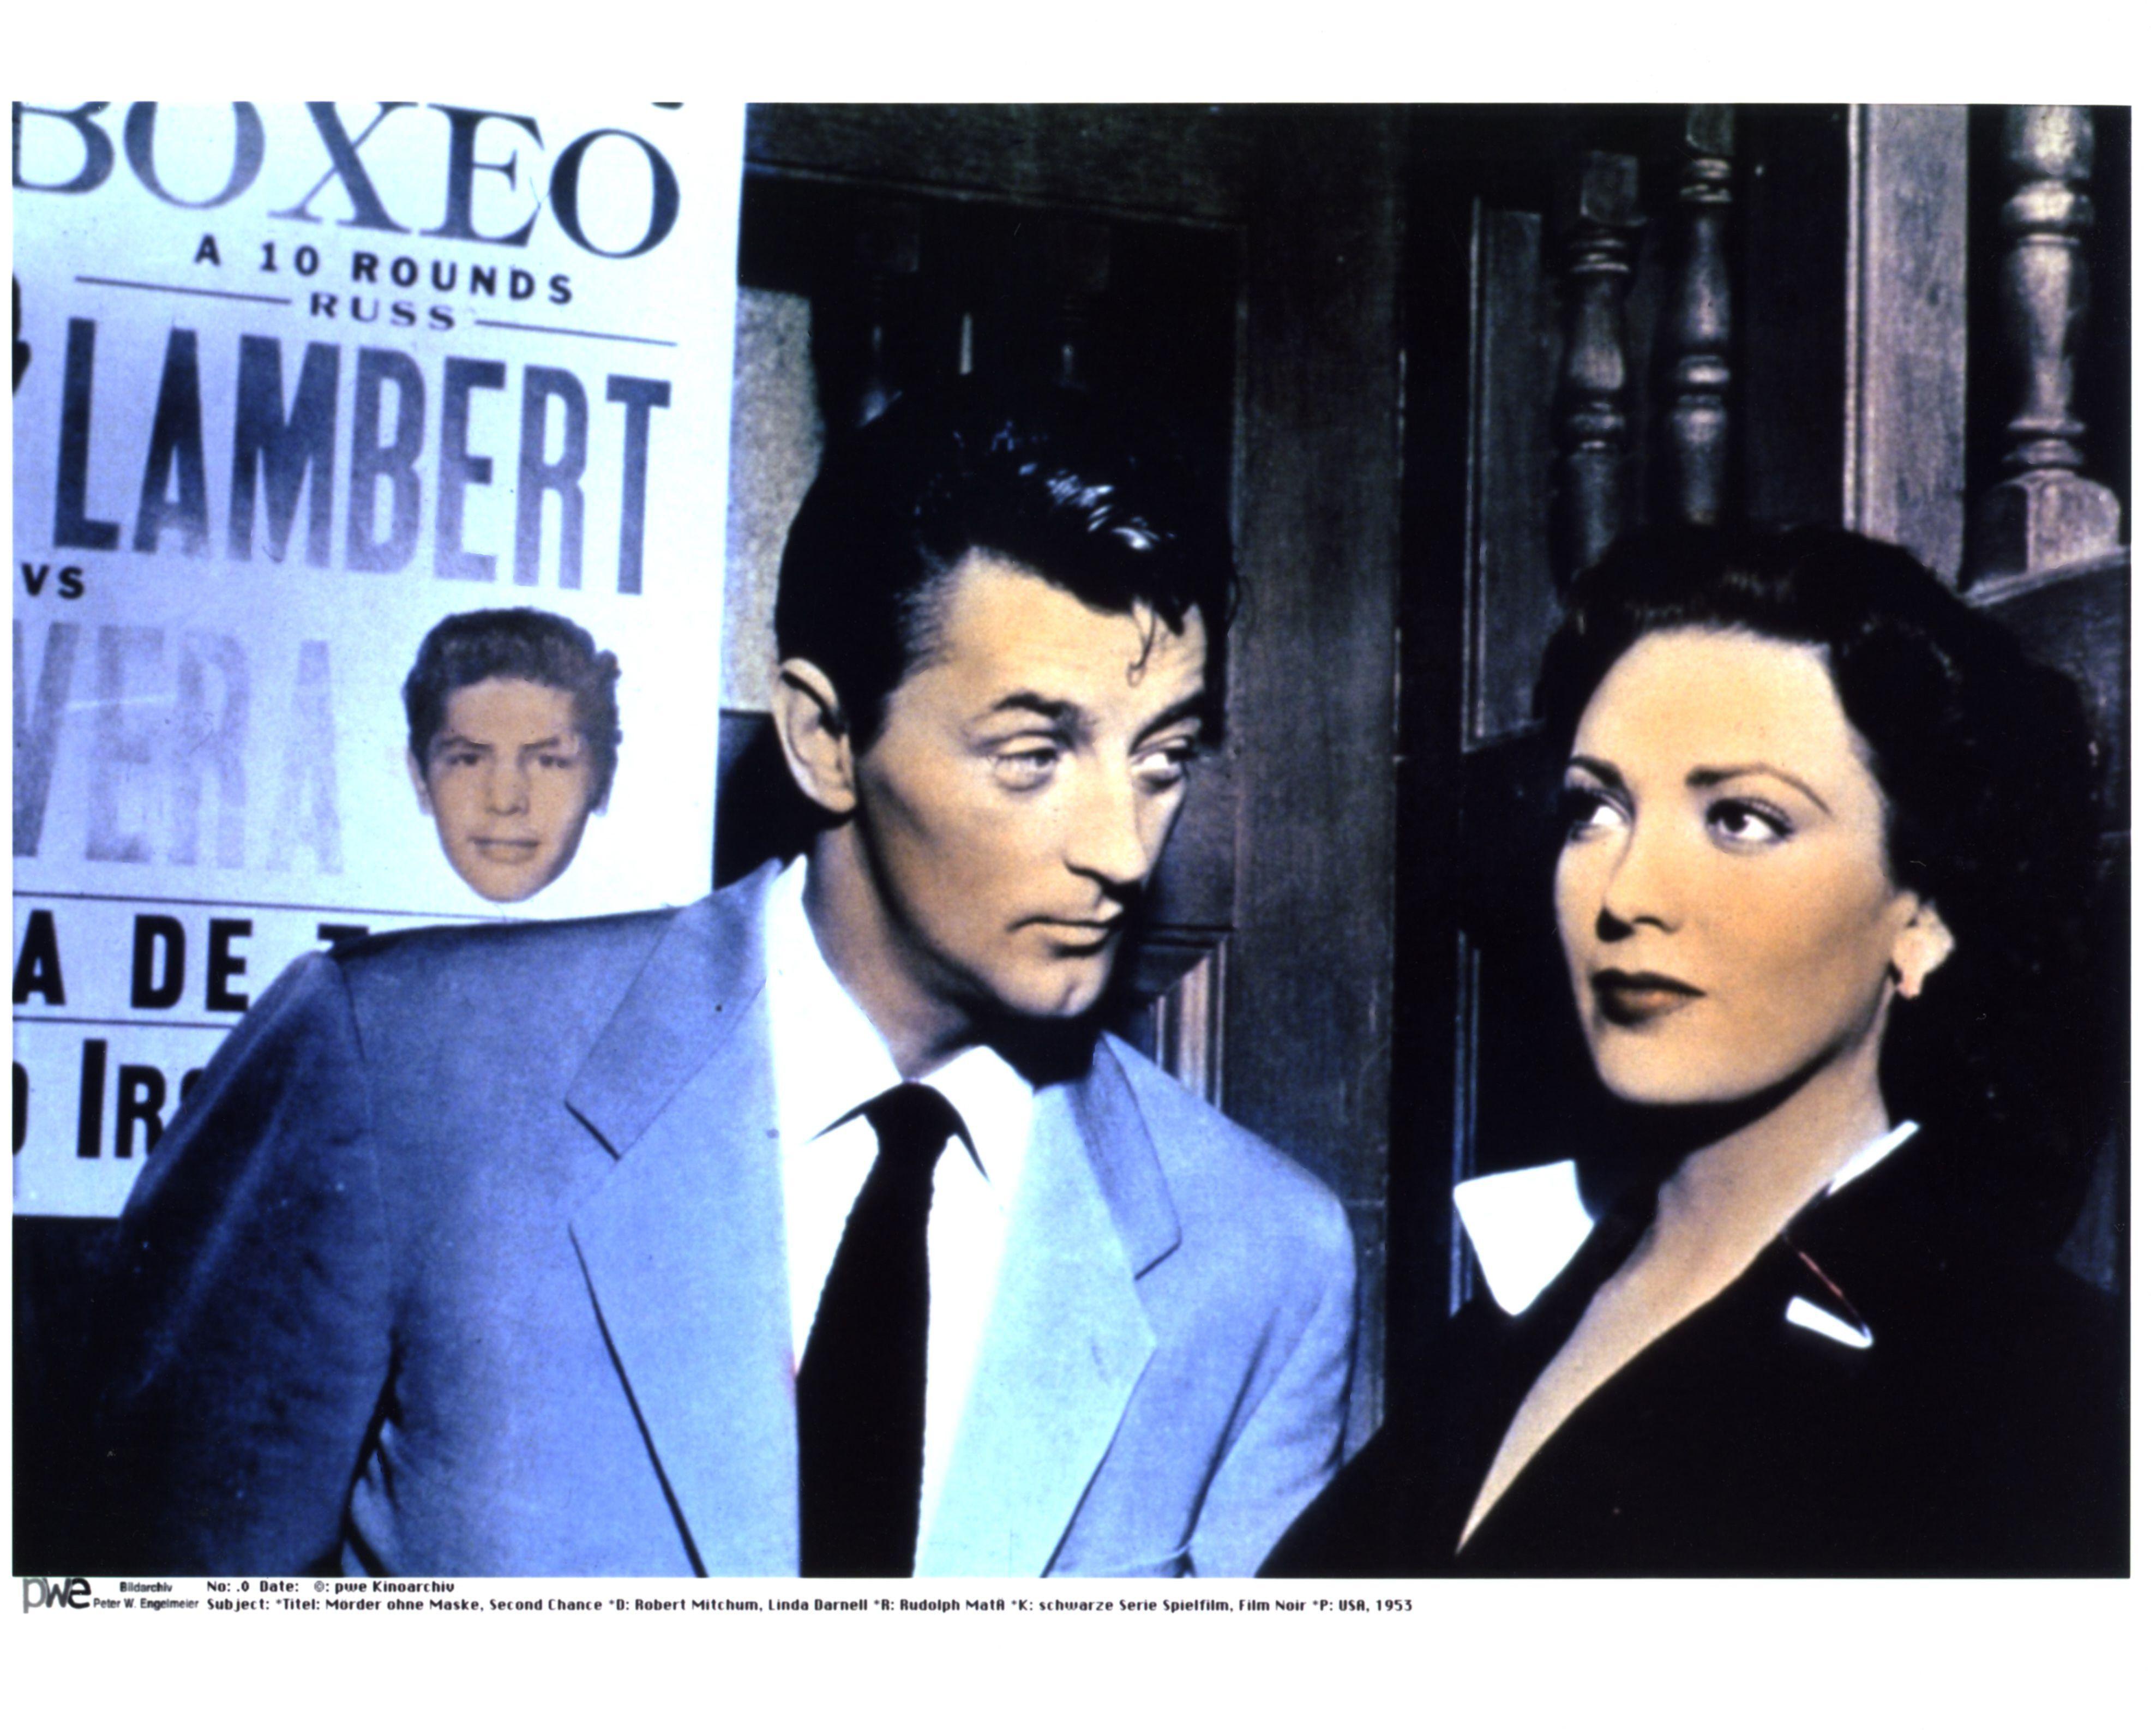 Robert Mitchum & Linda Darnell